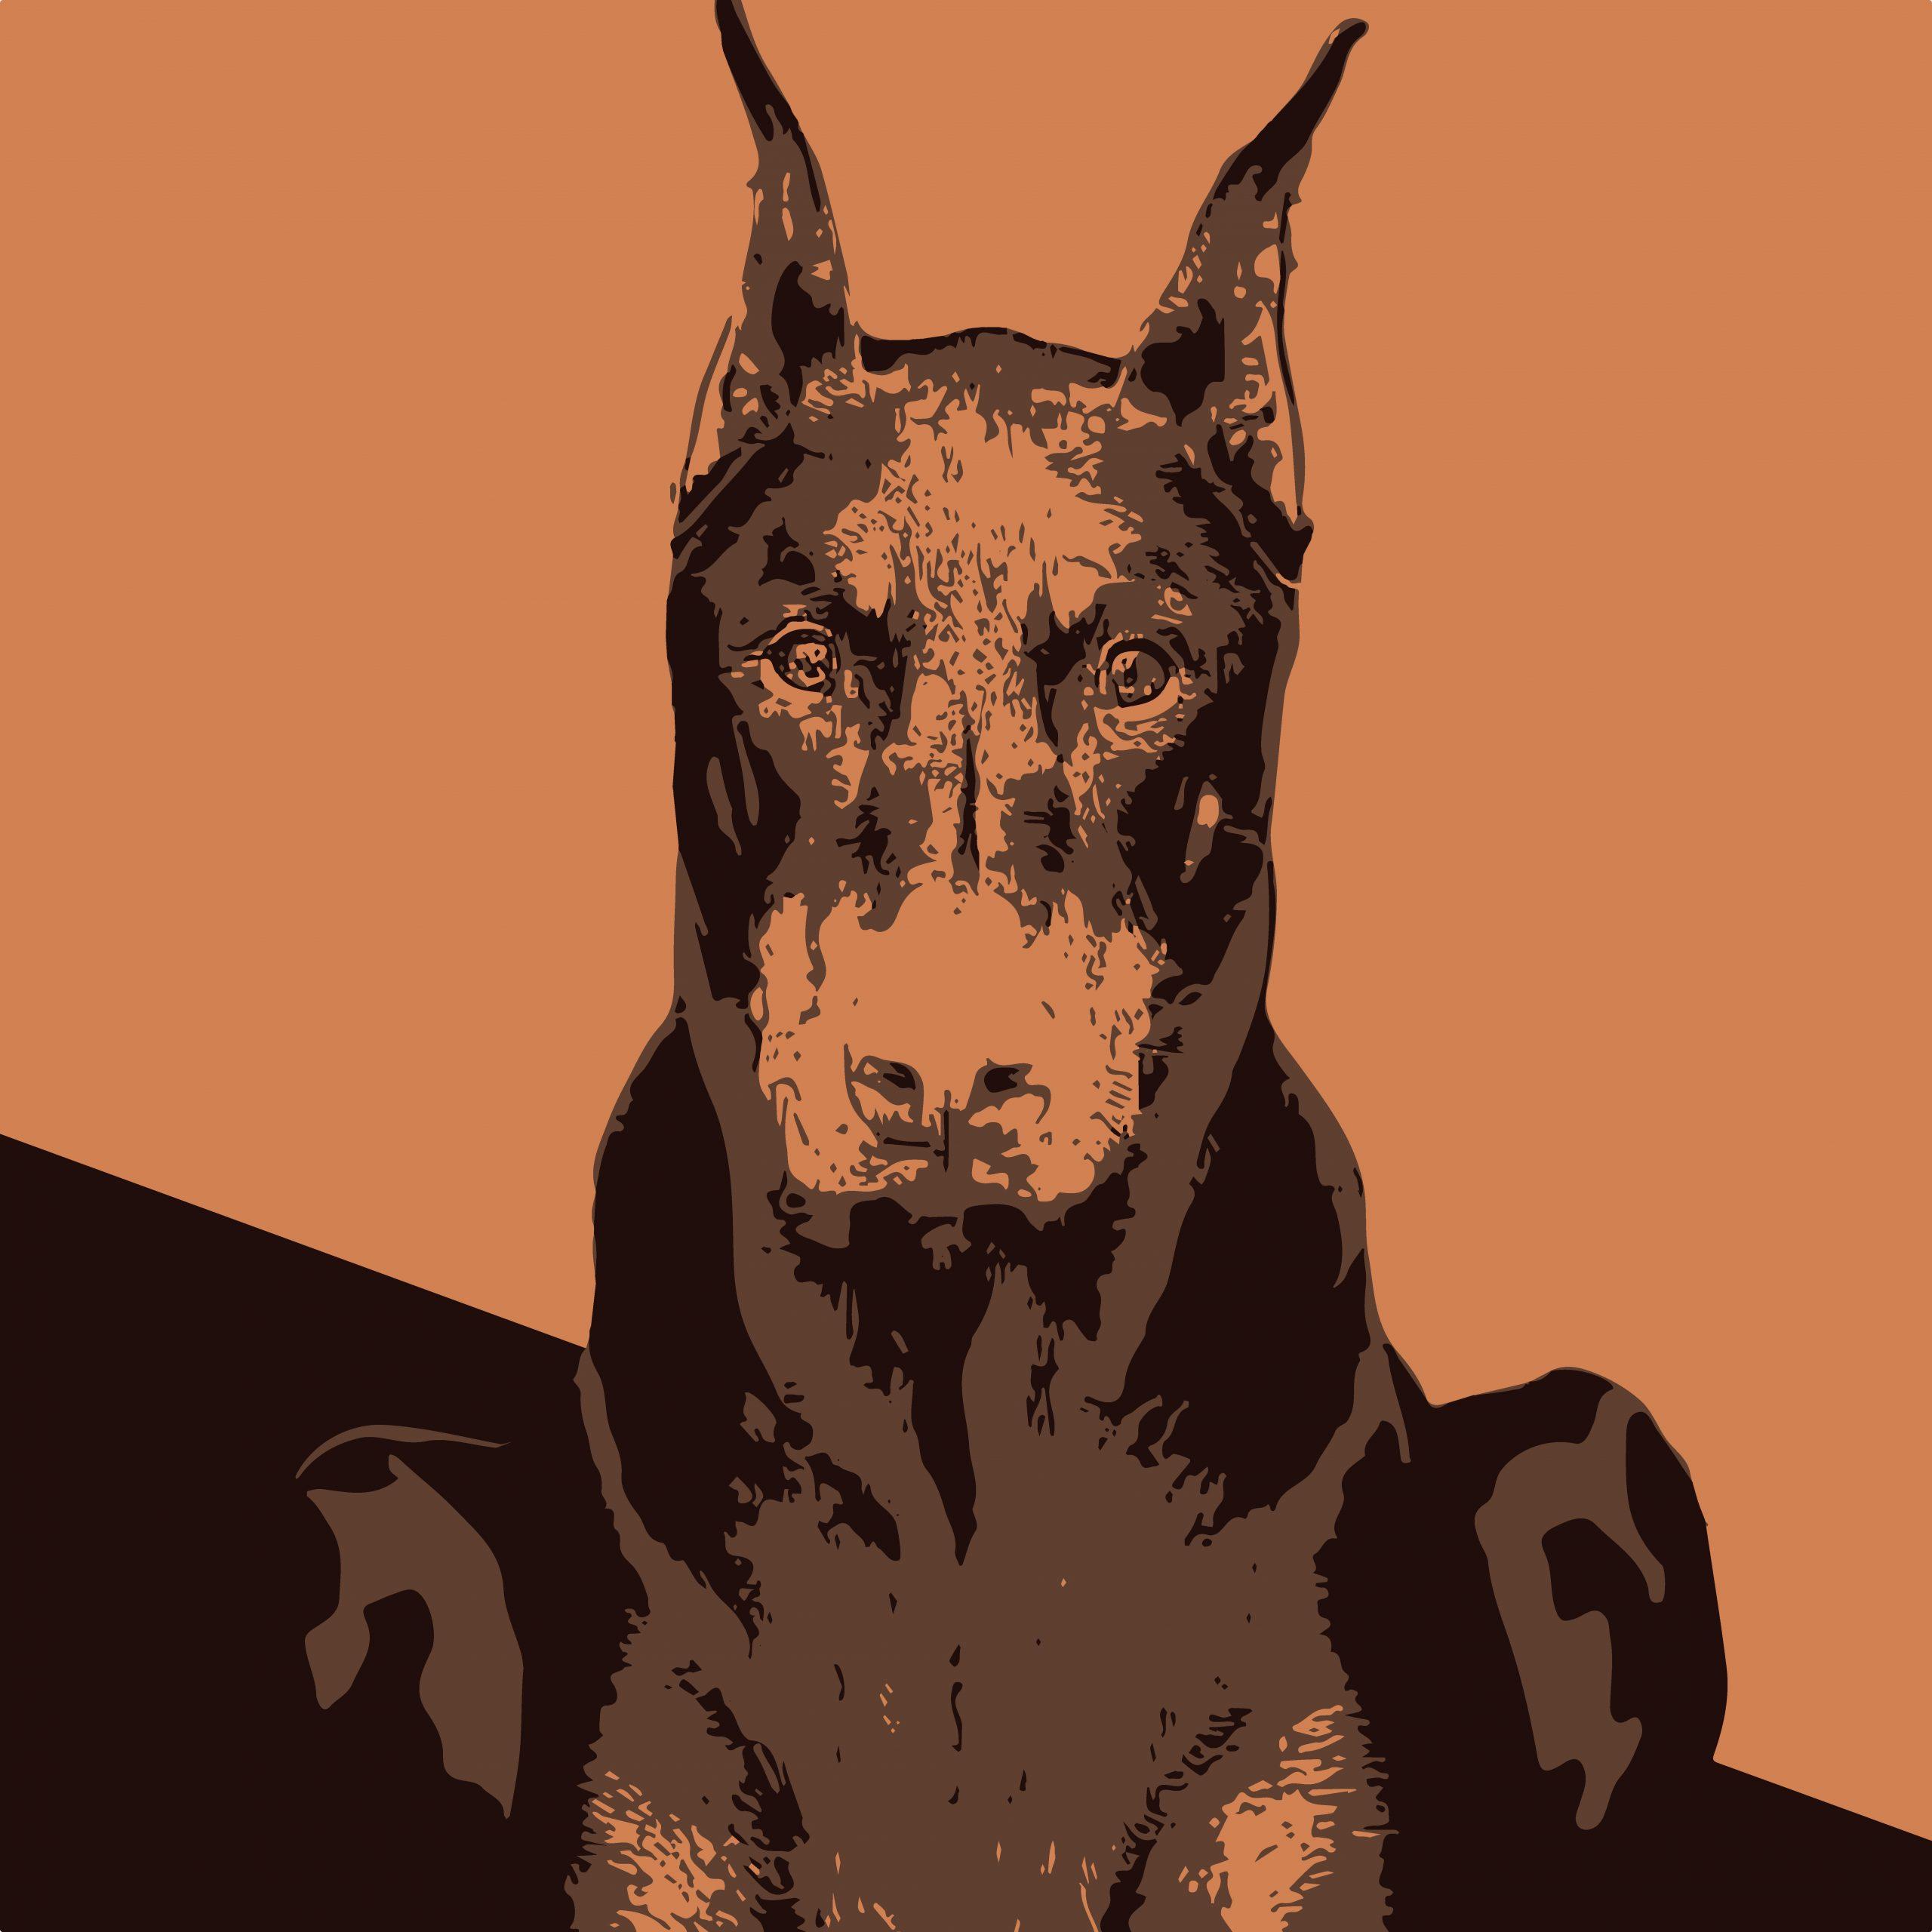 Illustration of guard dog